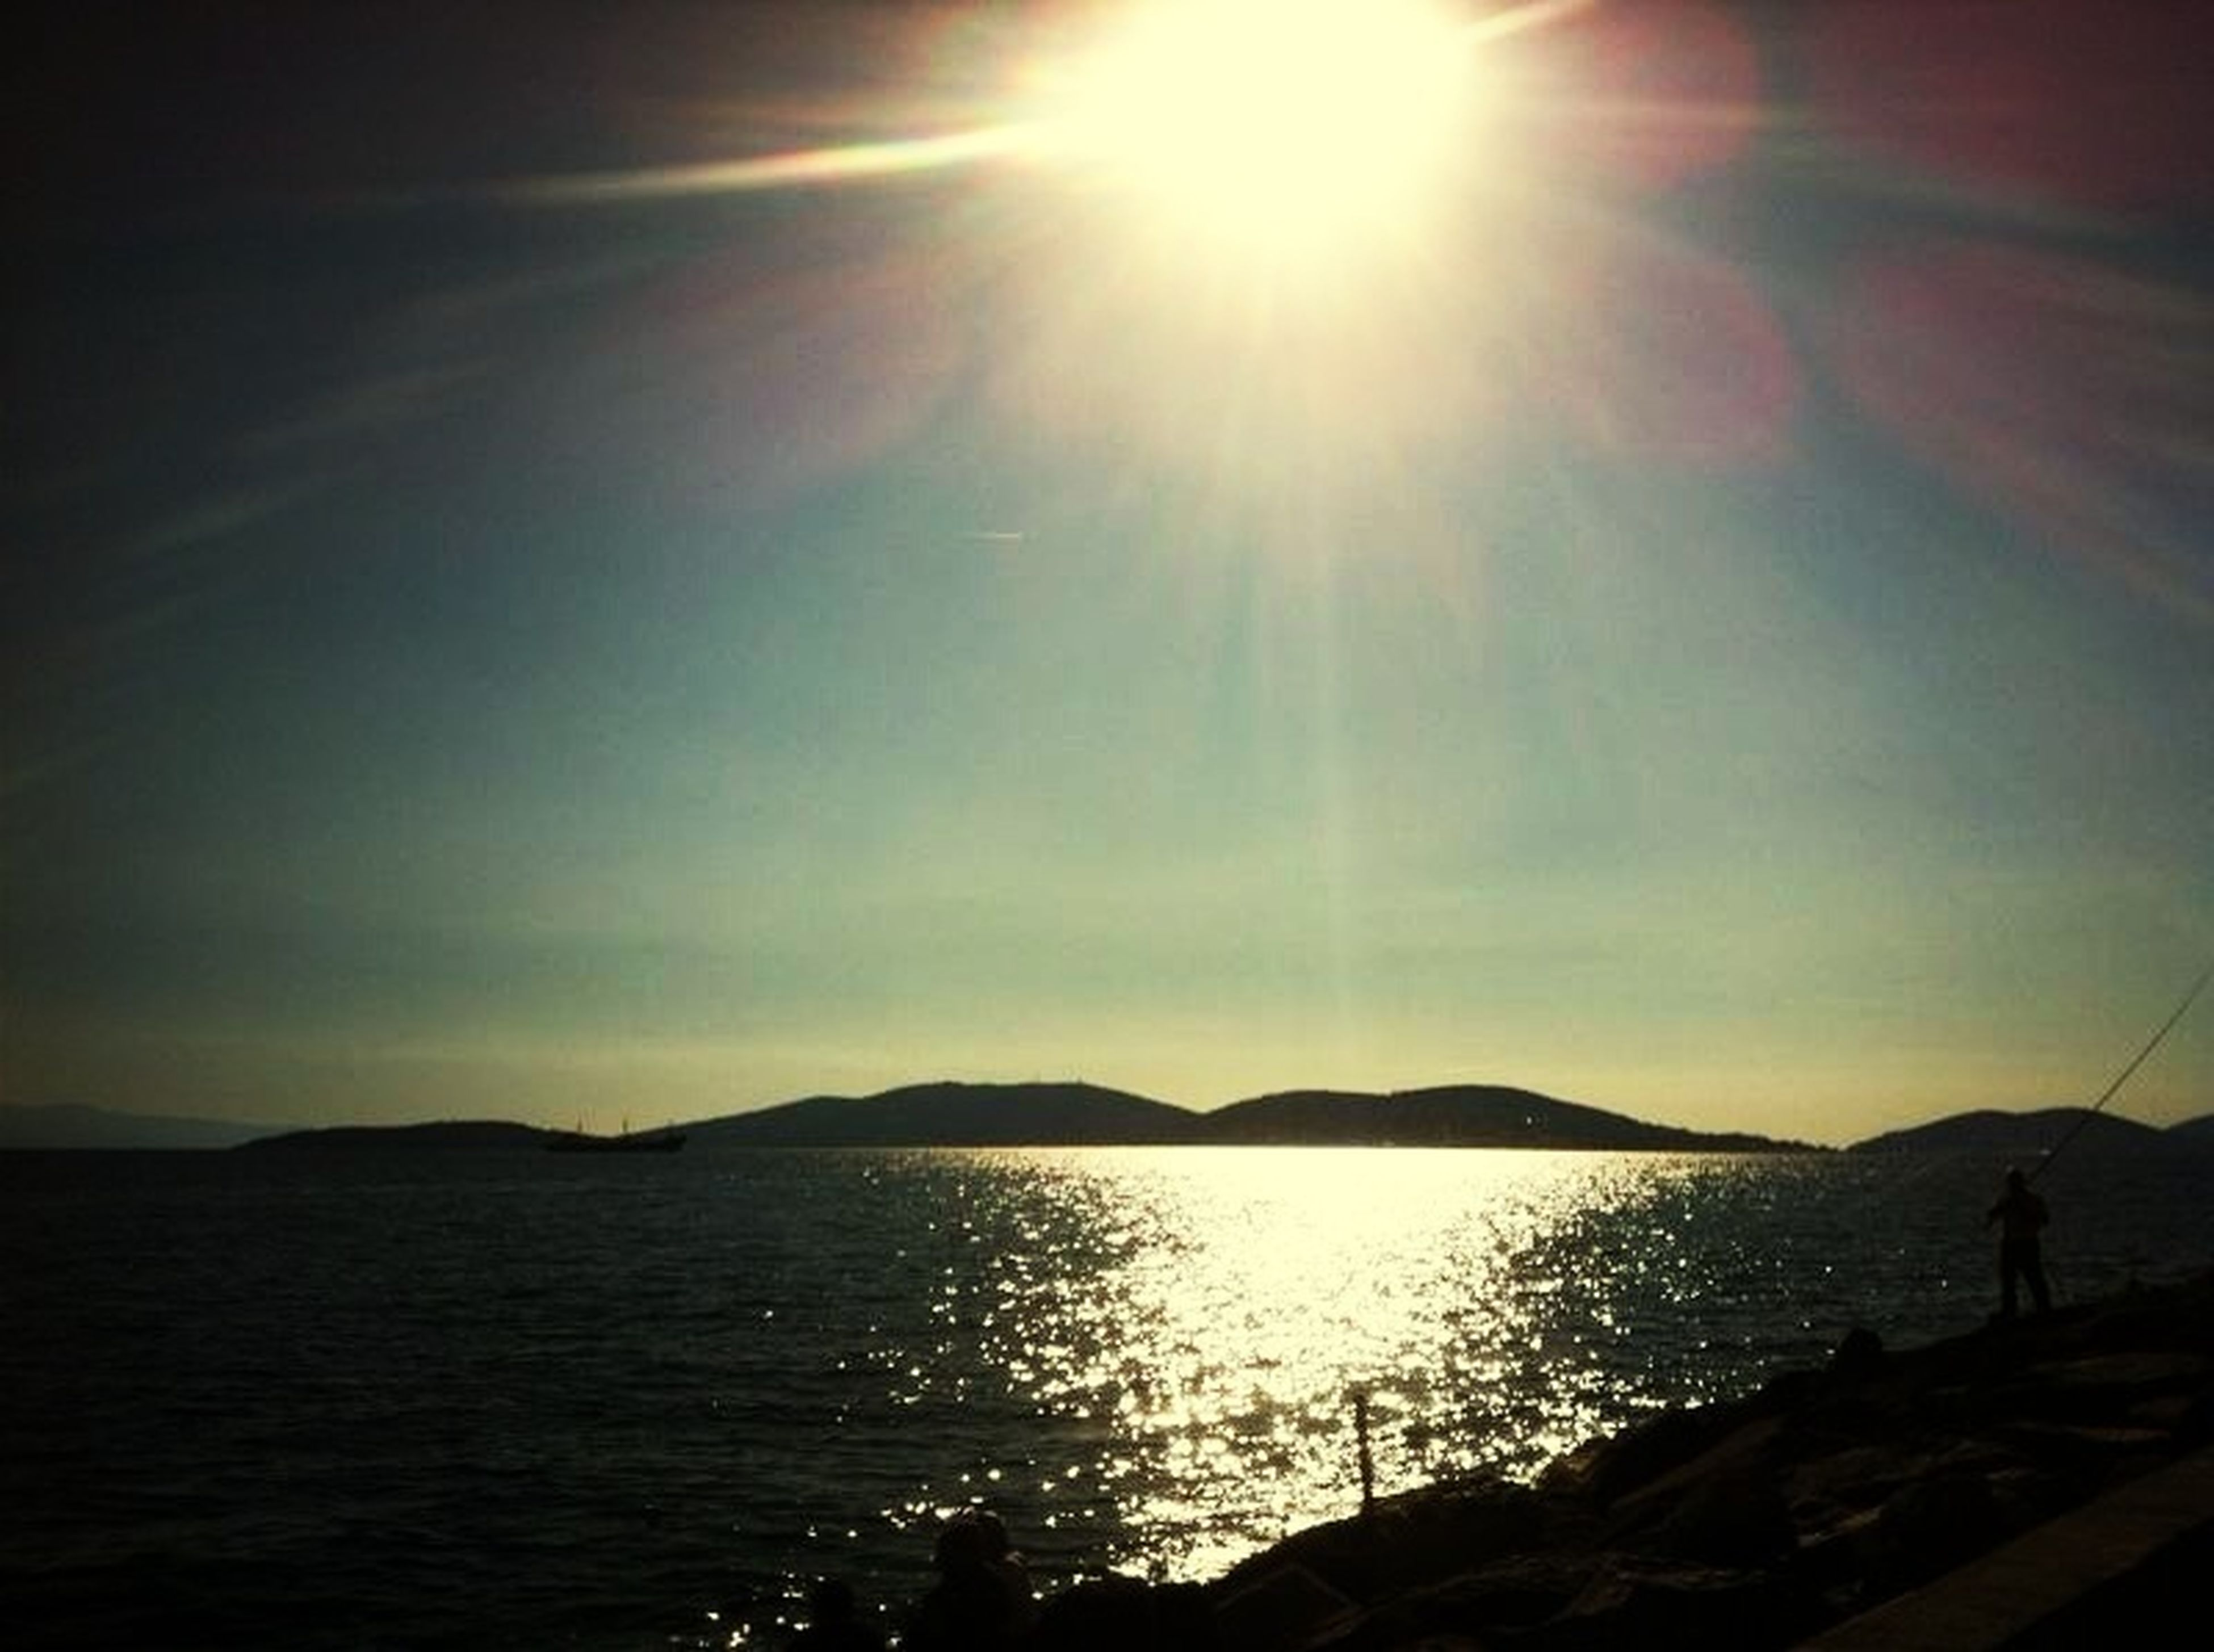 sun, water, sunbeam, tranquil scene, scenics, tranquility, sunlight, sea, beauty in nature, mountain, lens flare, sky, nature, mountain range, idyllic, reflection, sunset, bright, silhouette, outdoors